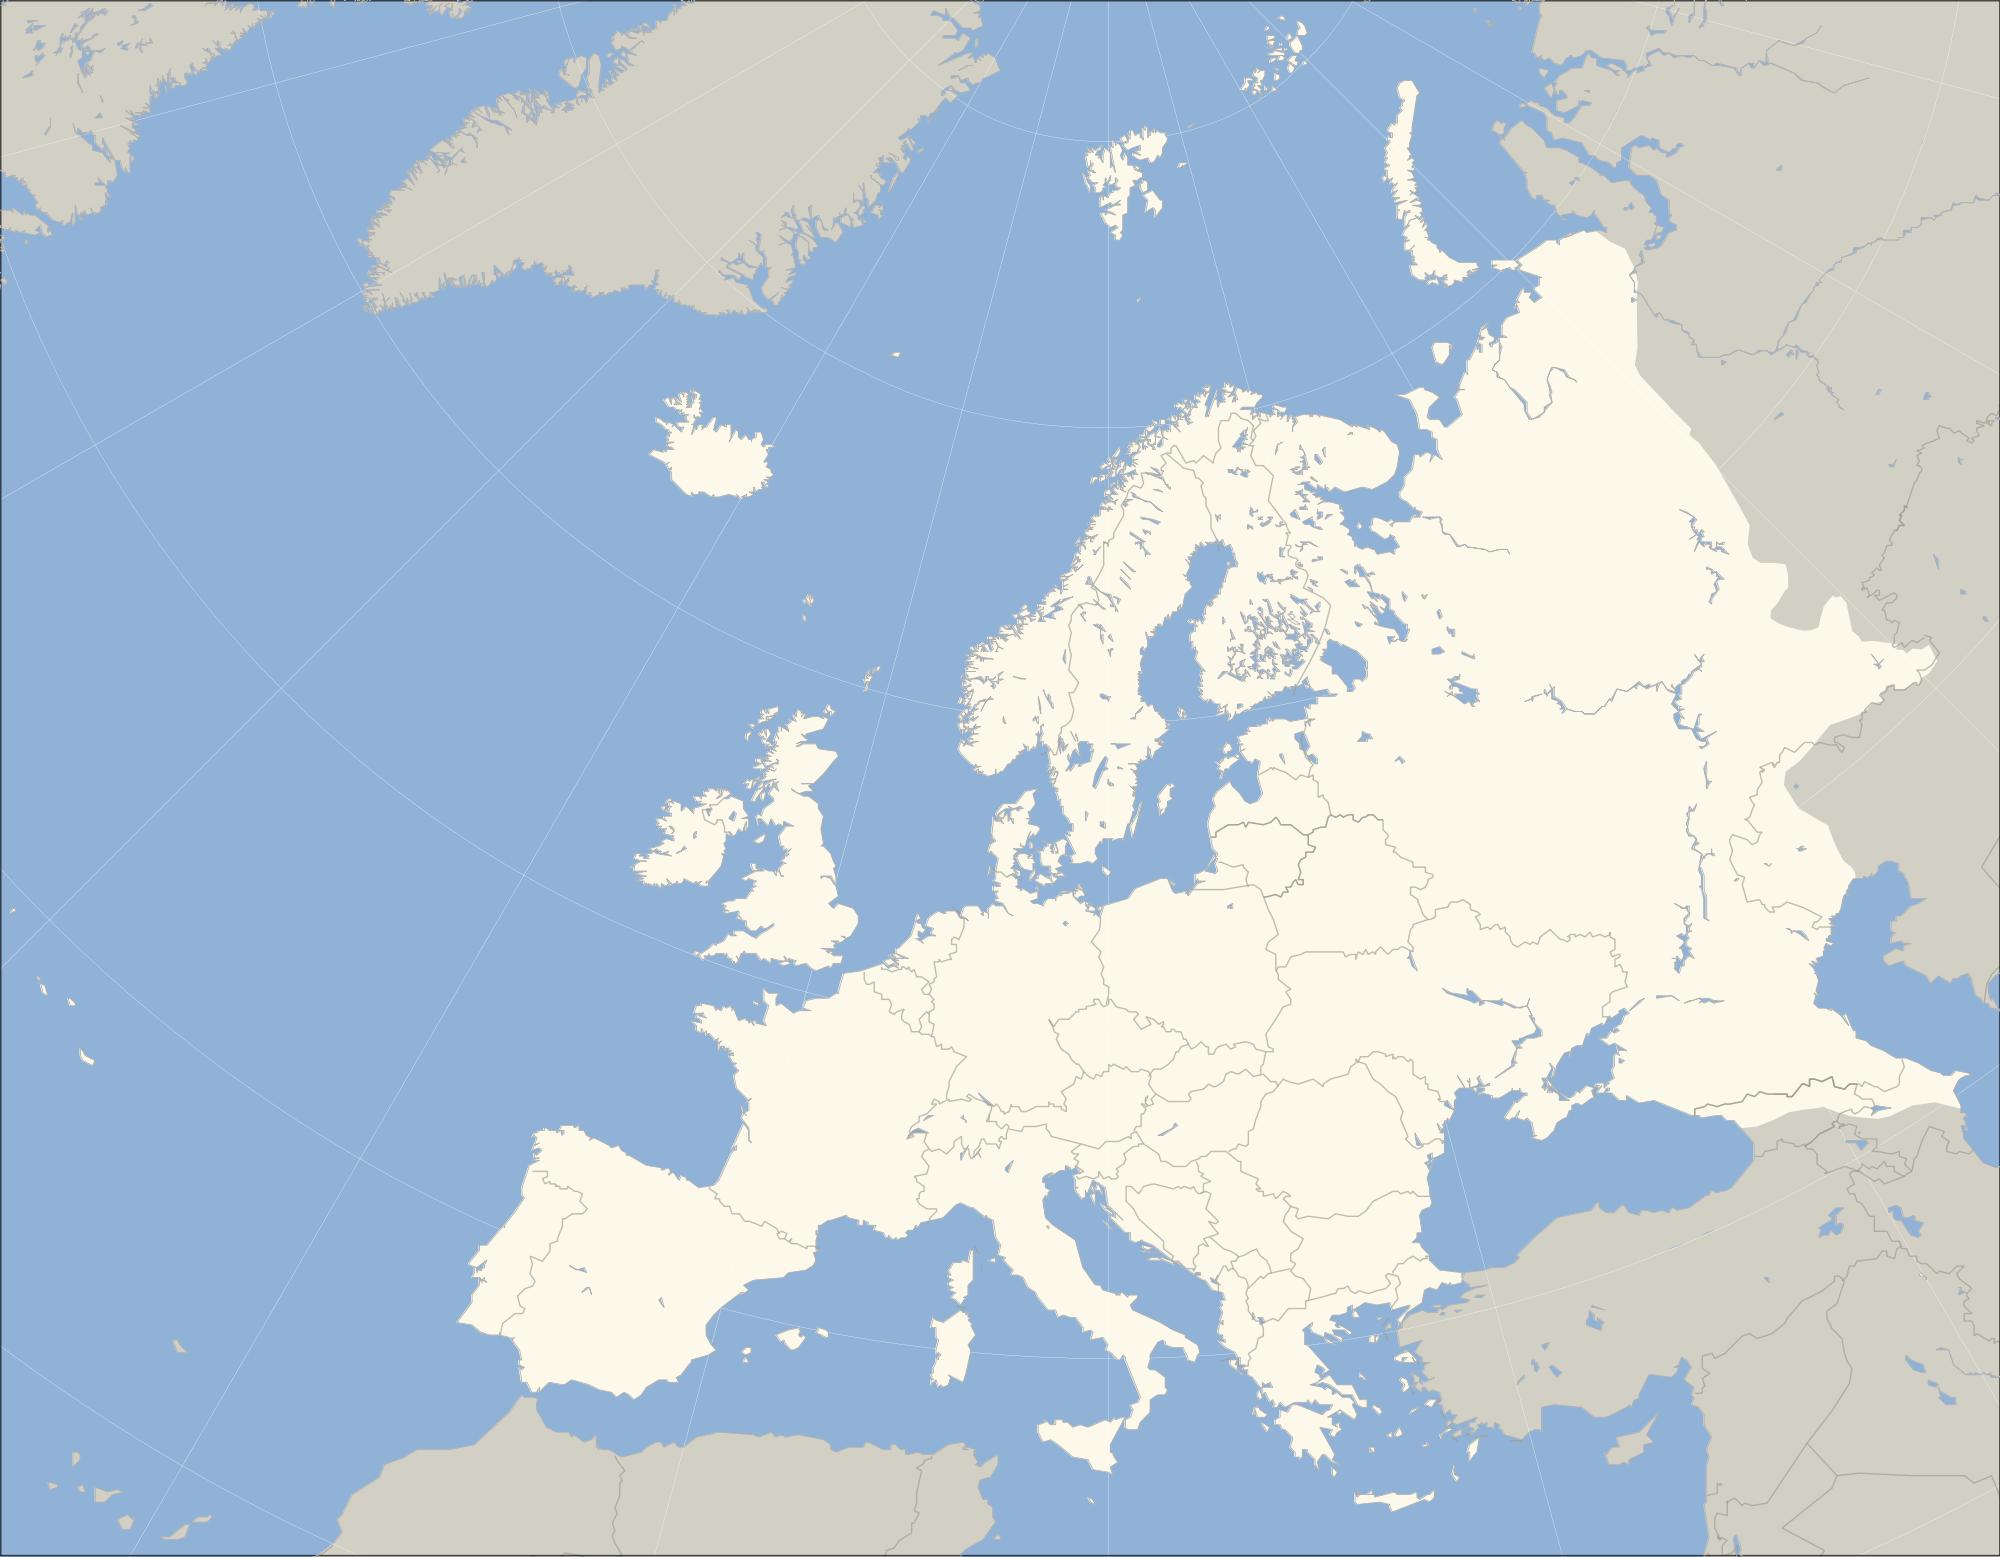 Mapa-Mudo-de-Europa